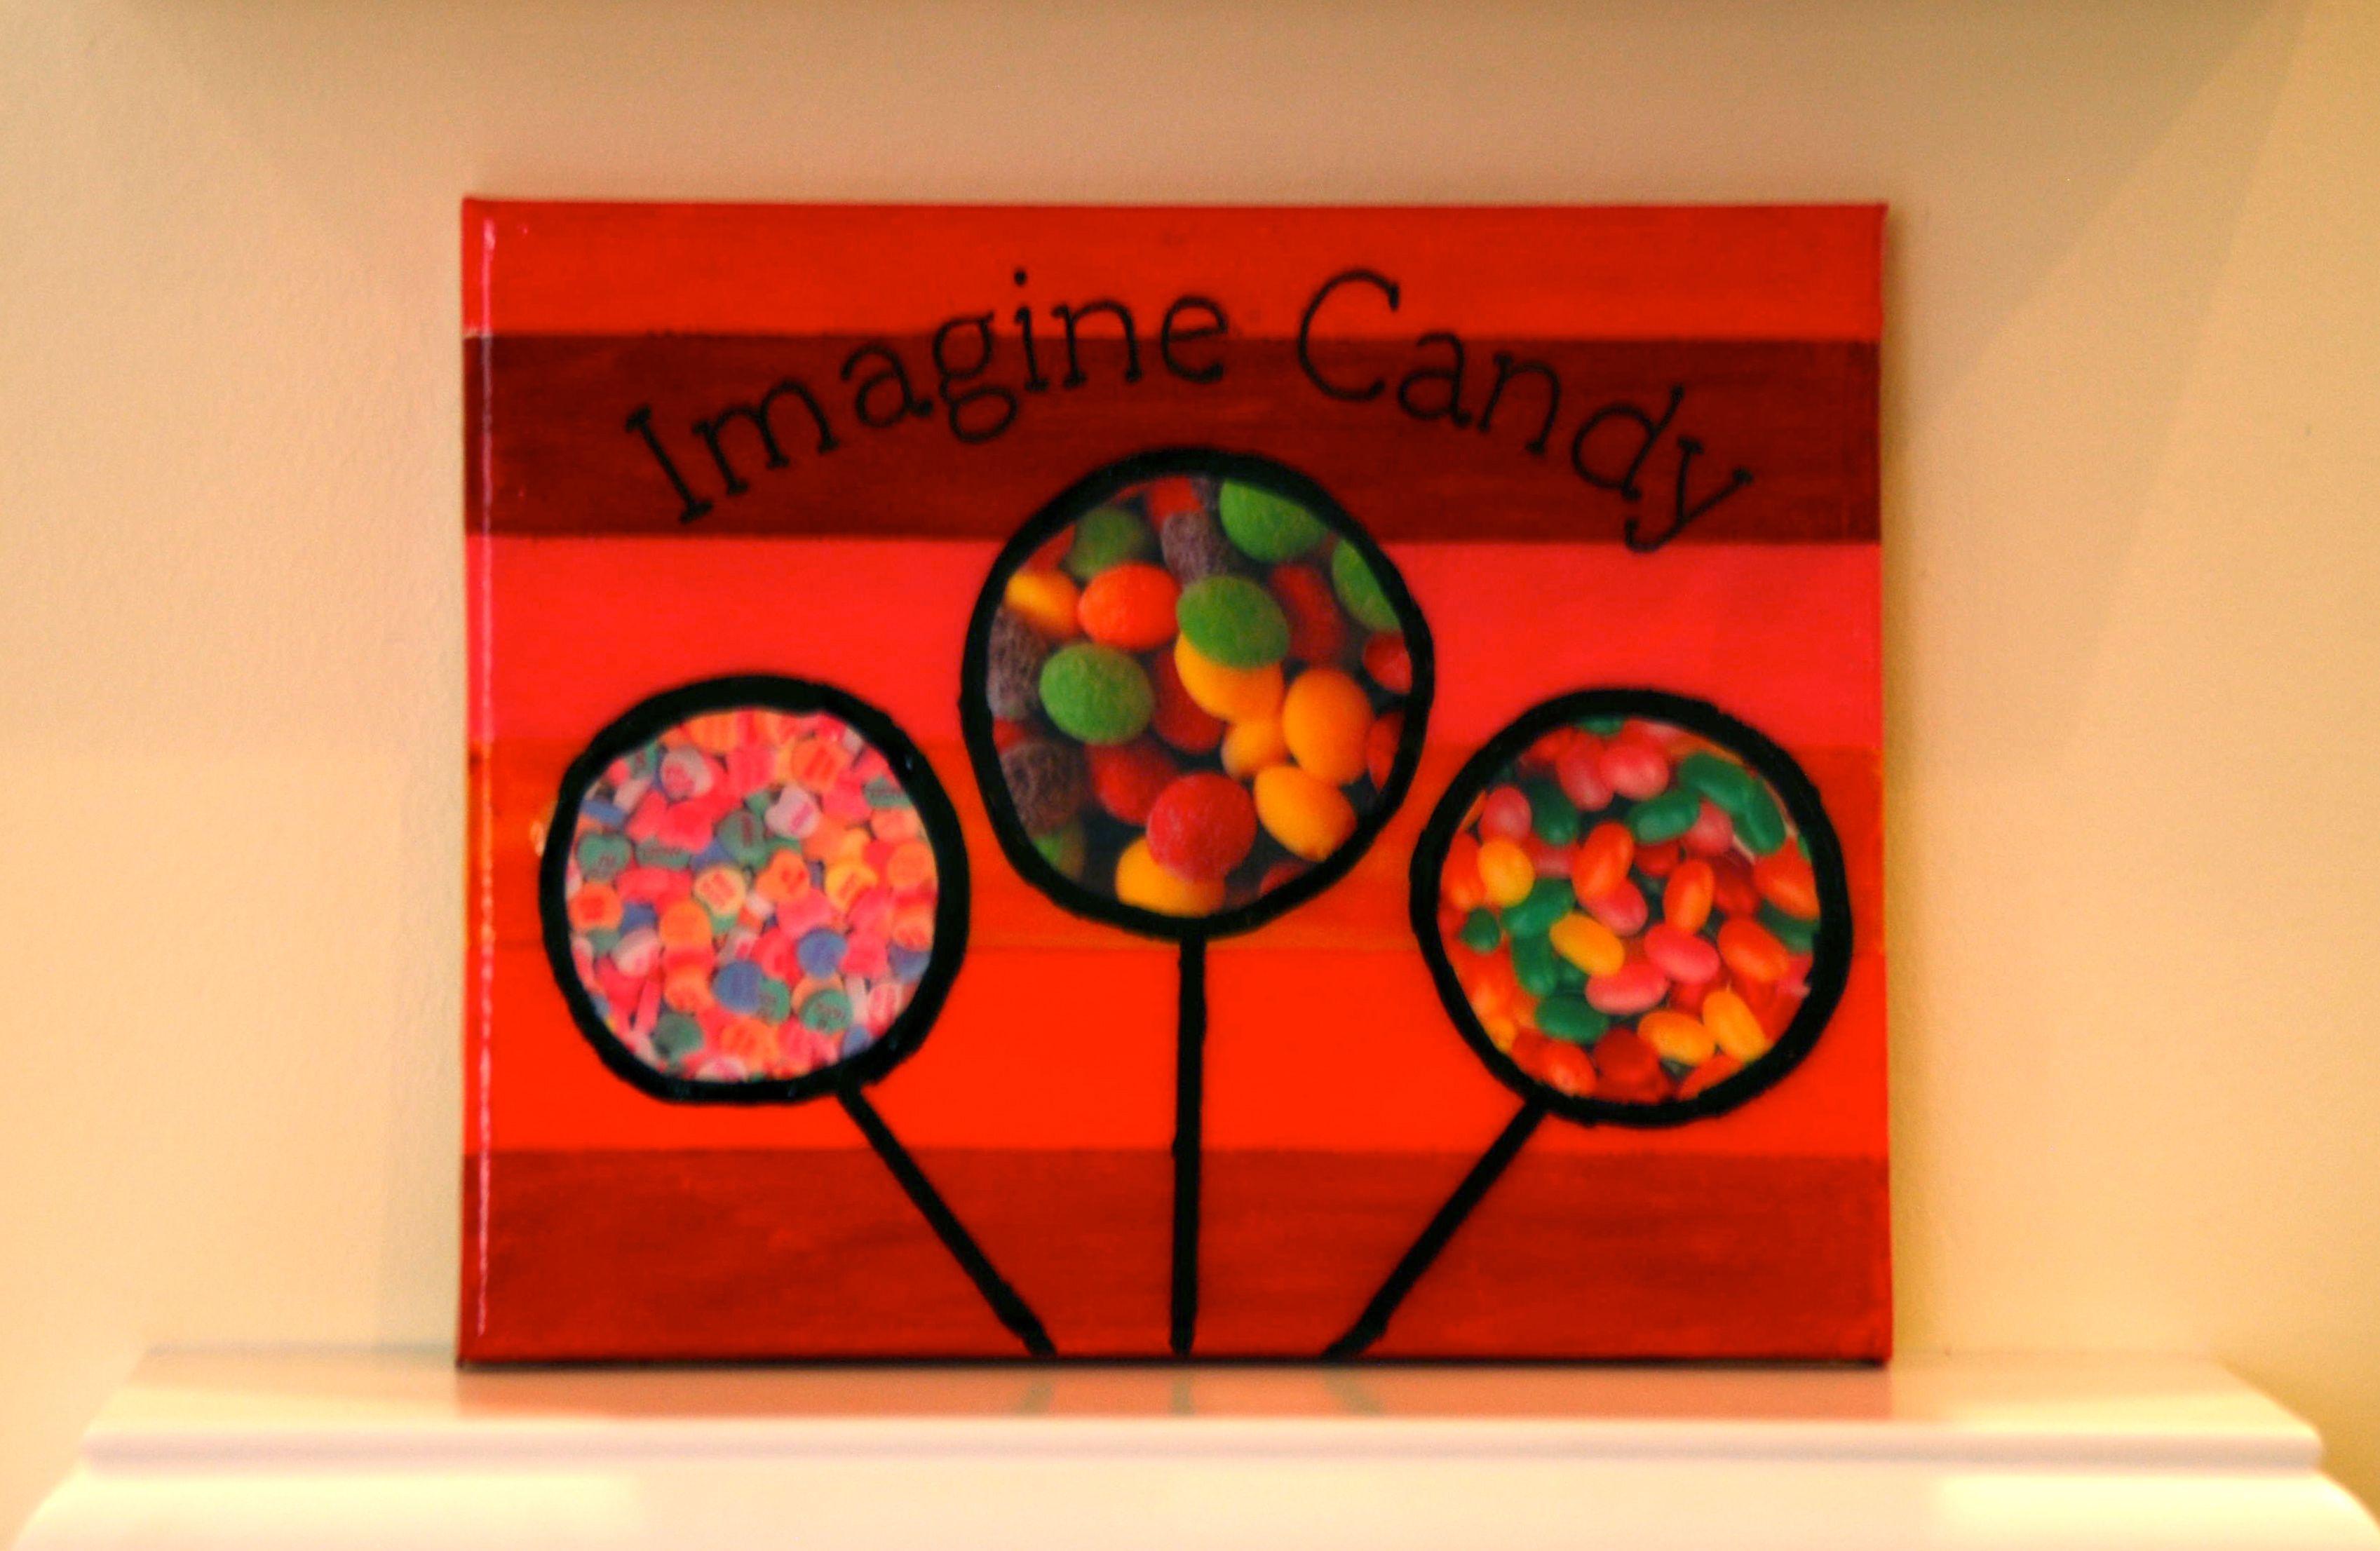 Imagine Candy- Candy Arts Artist: Natalie Gee